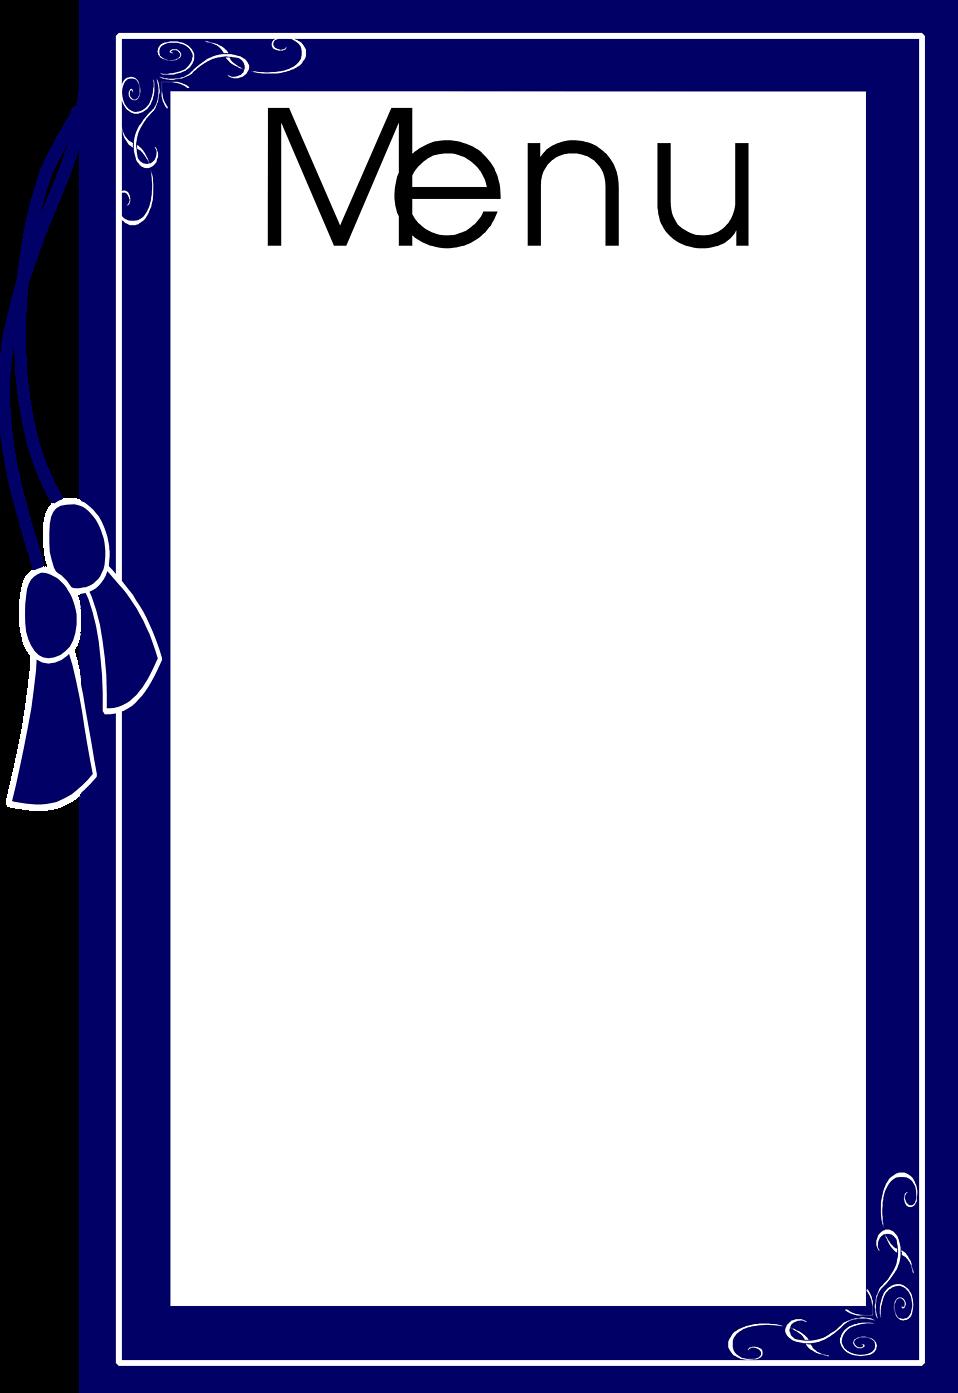 958x1393 Menu Free Stock Photo Illustration Of A Blank Food Menu